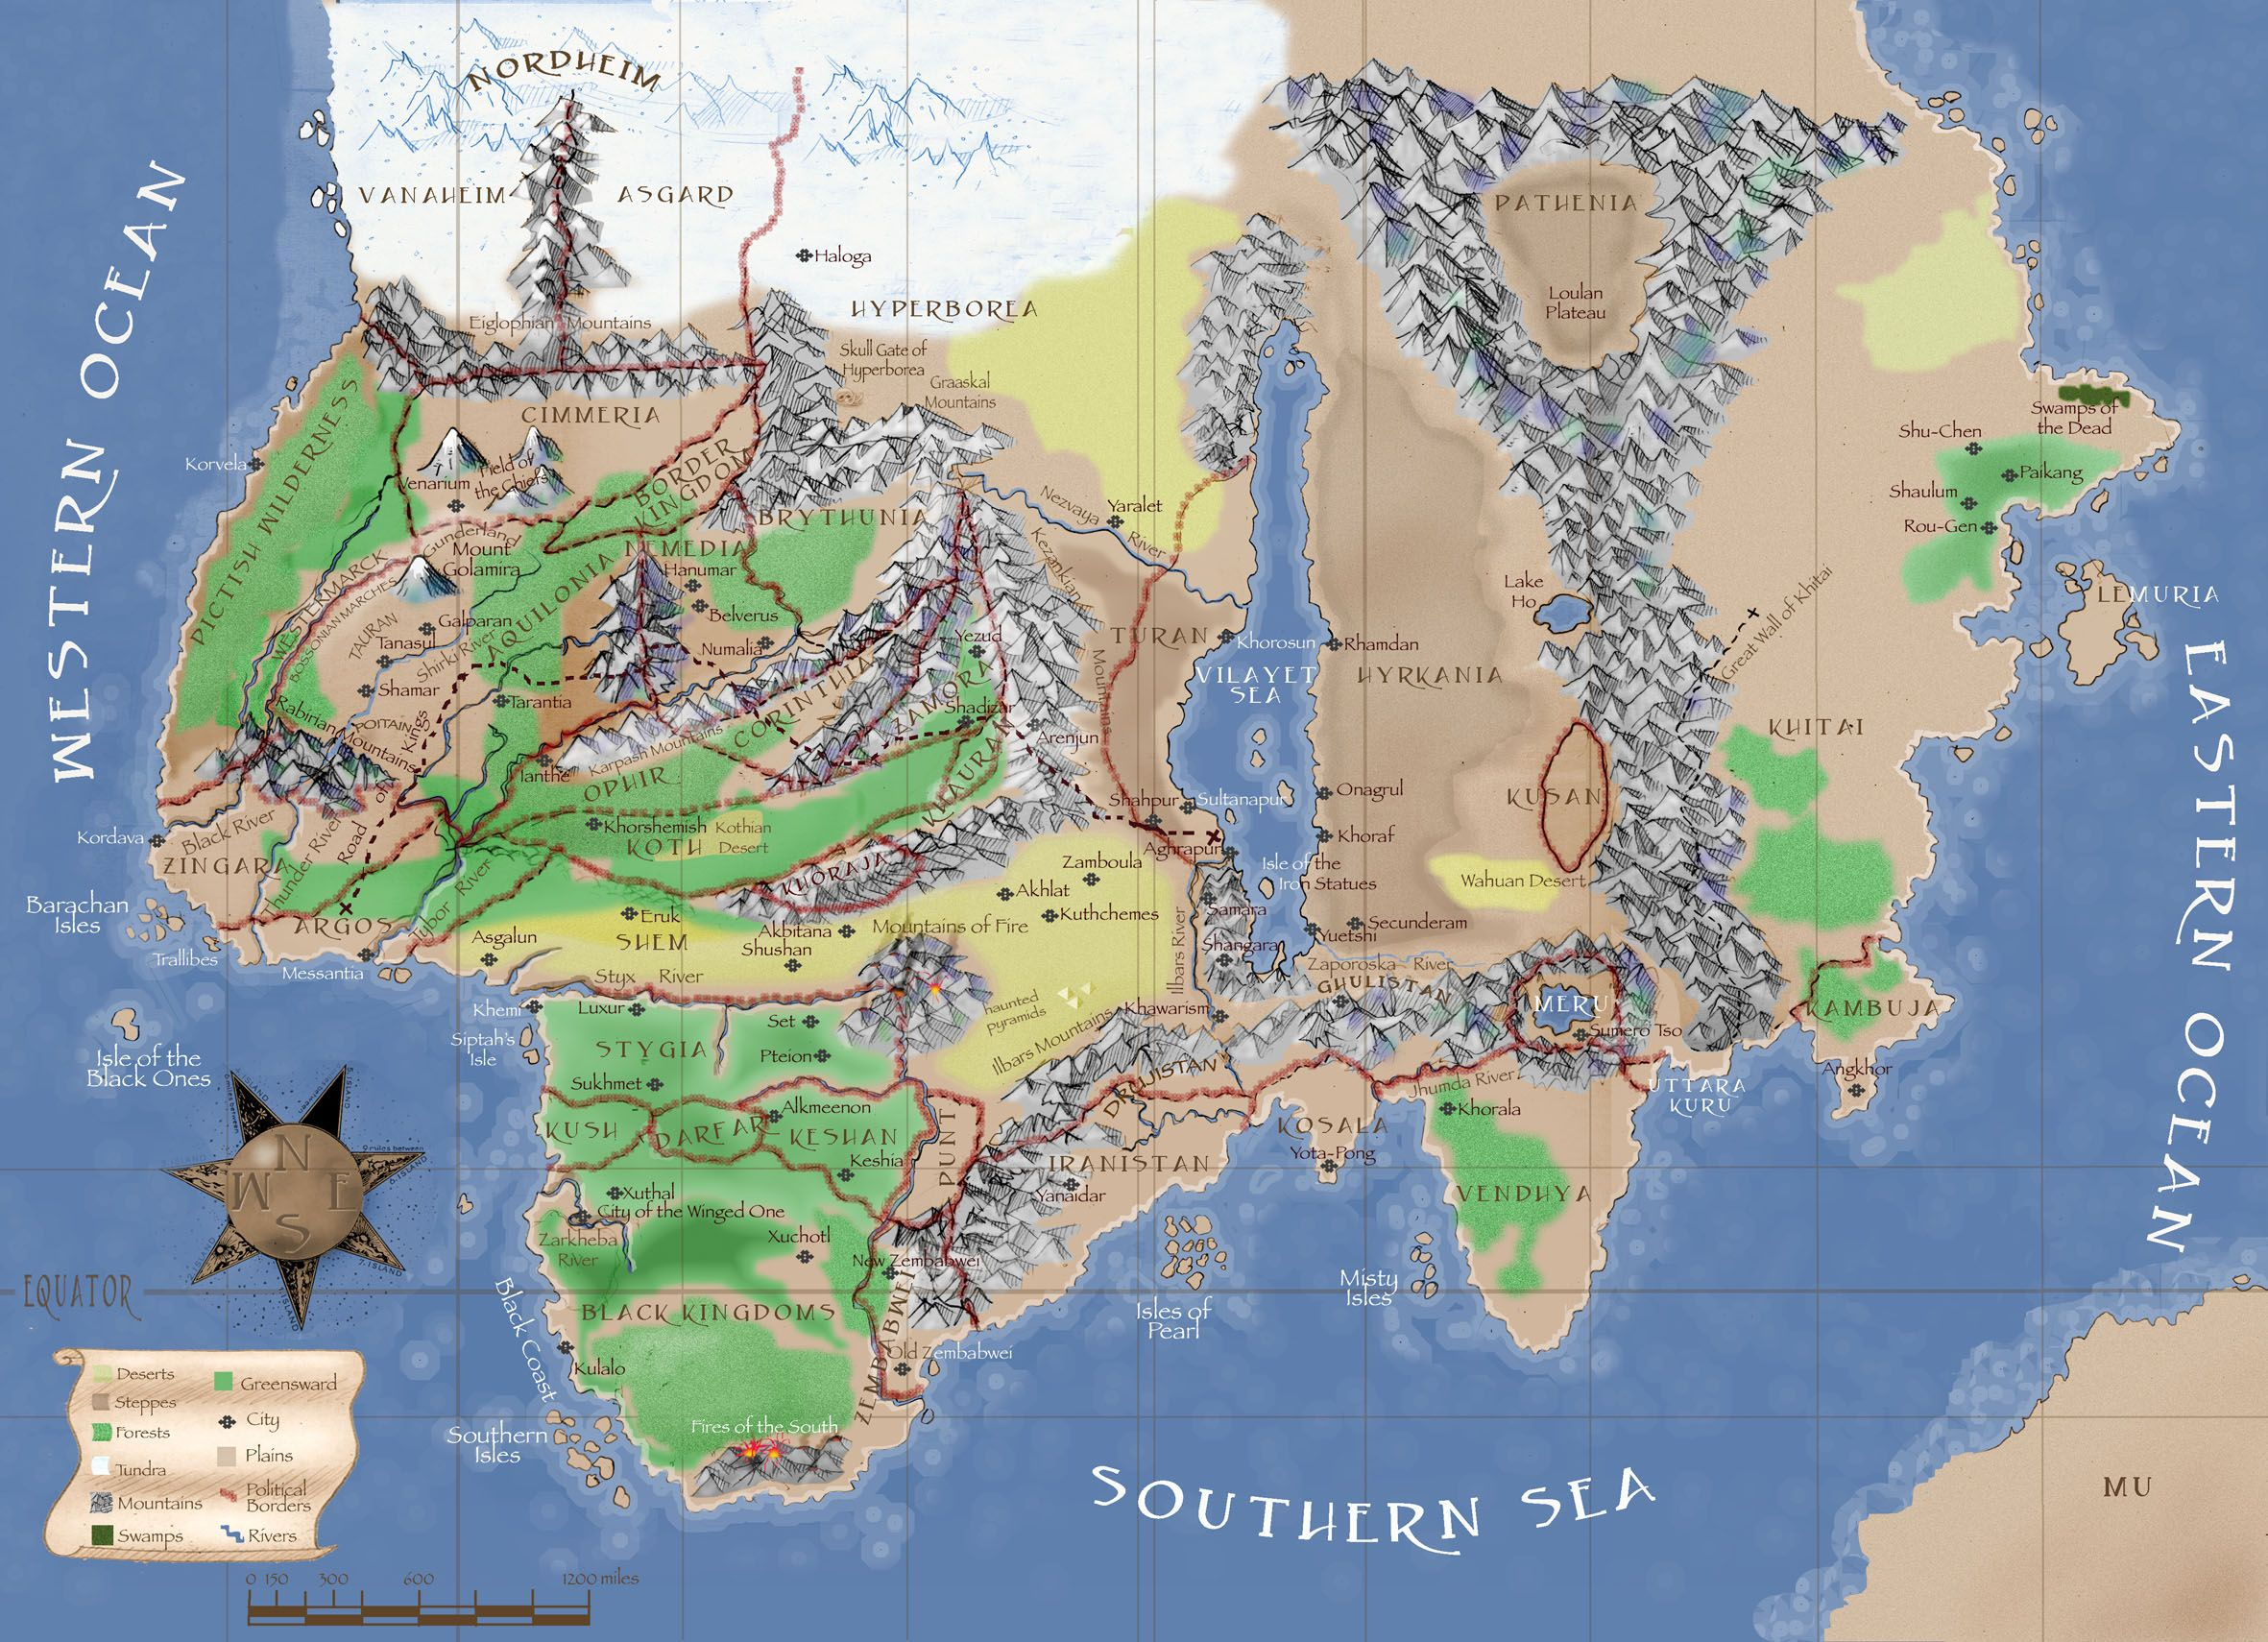 hyborian map